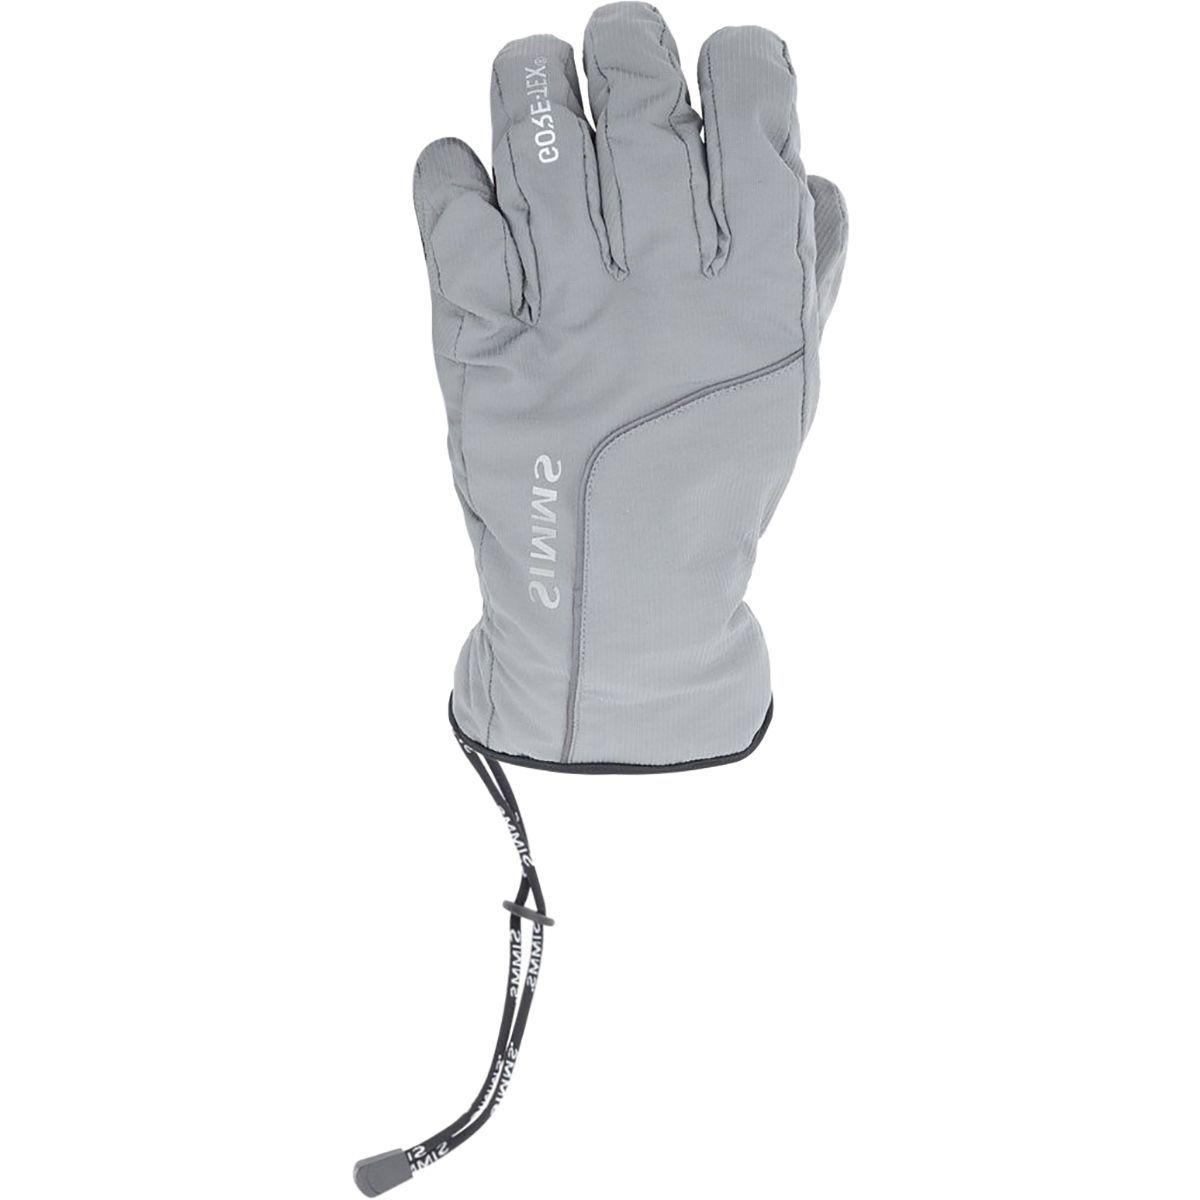 Simms Prodry Glove Plus Liner - Men's